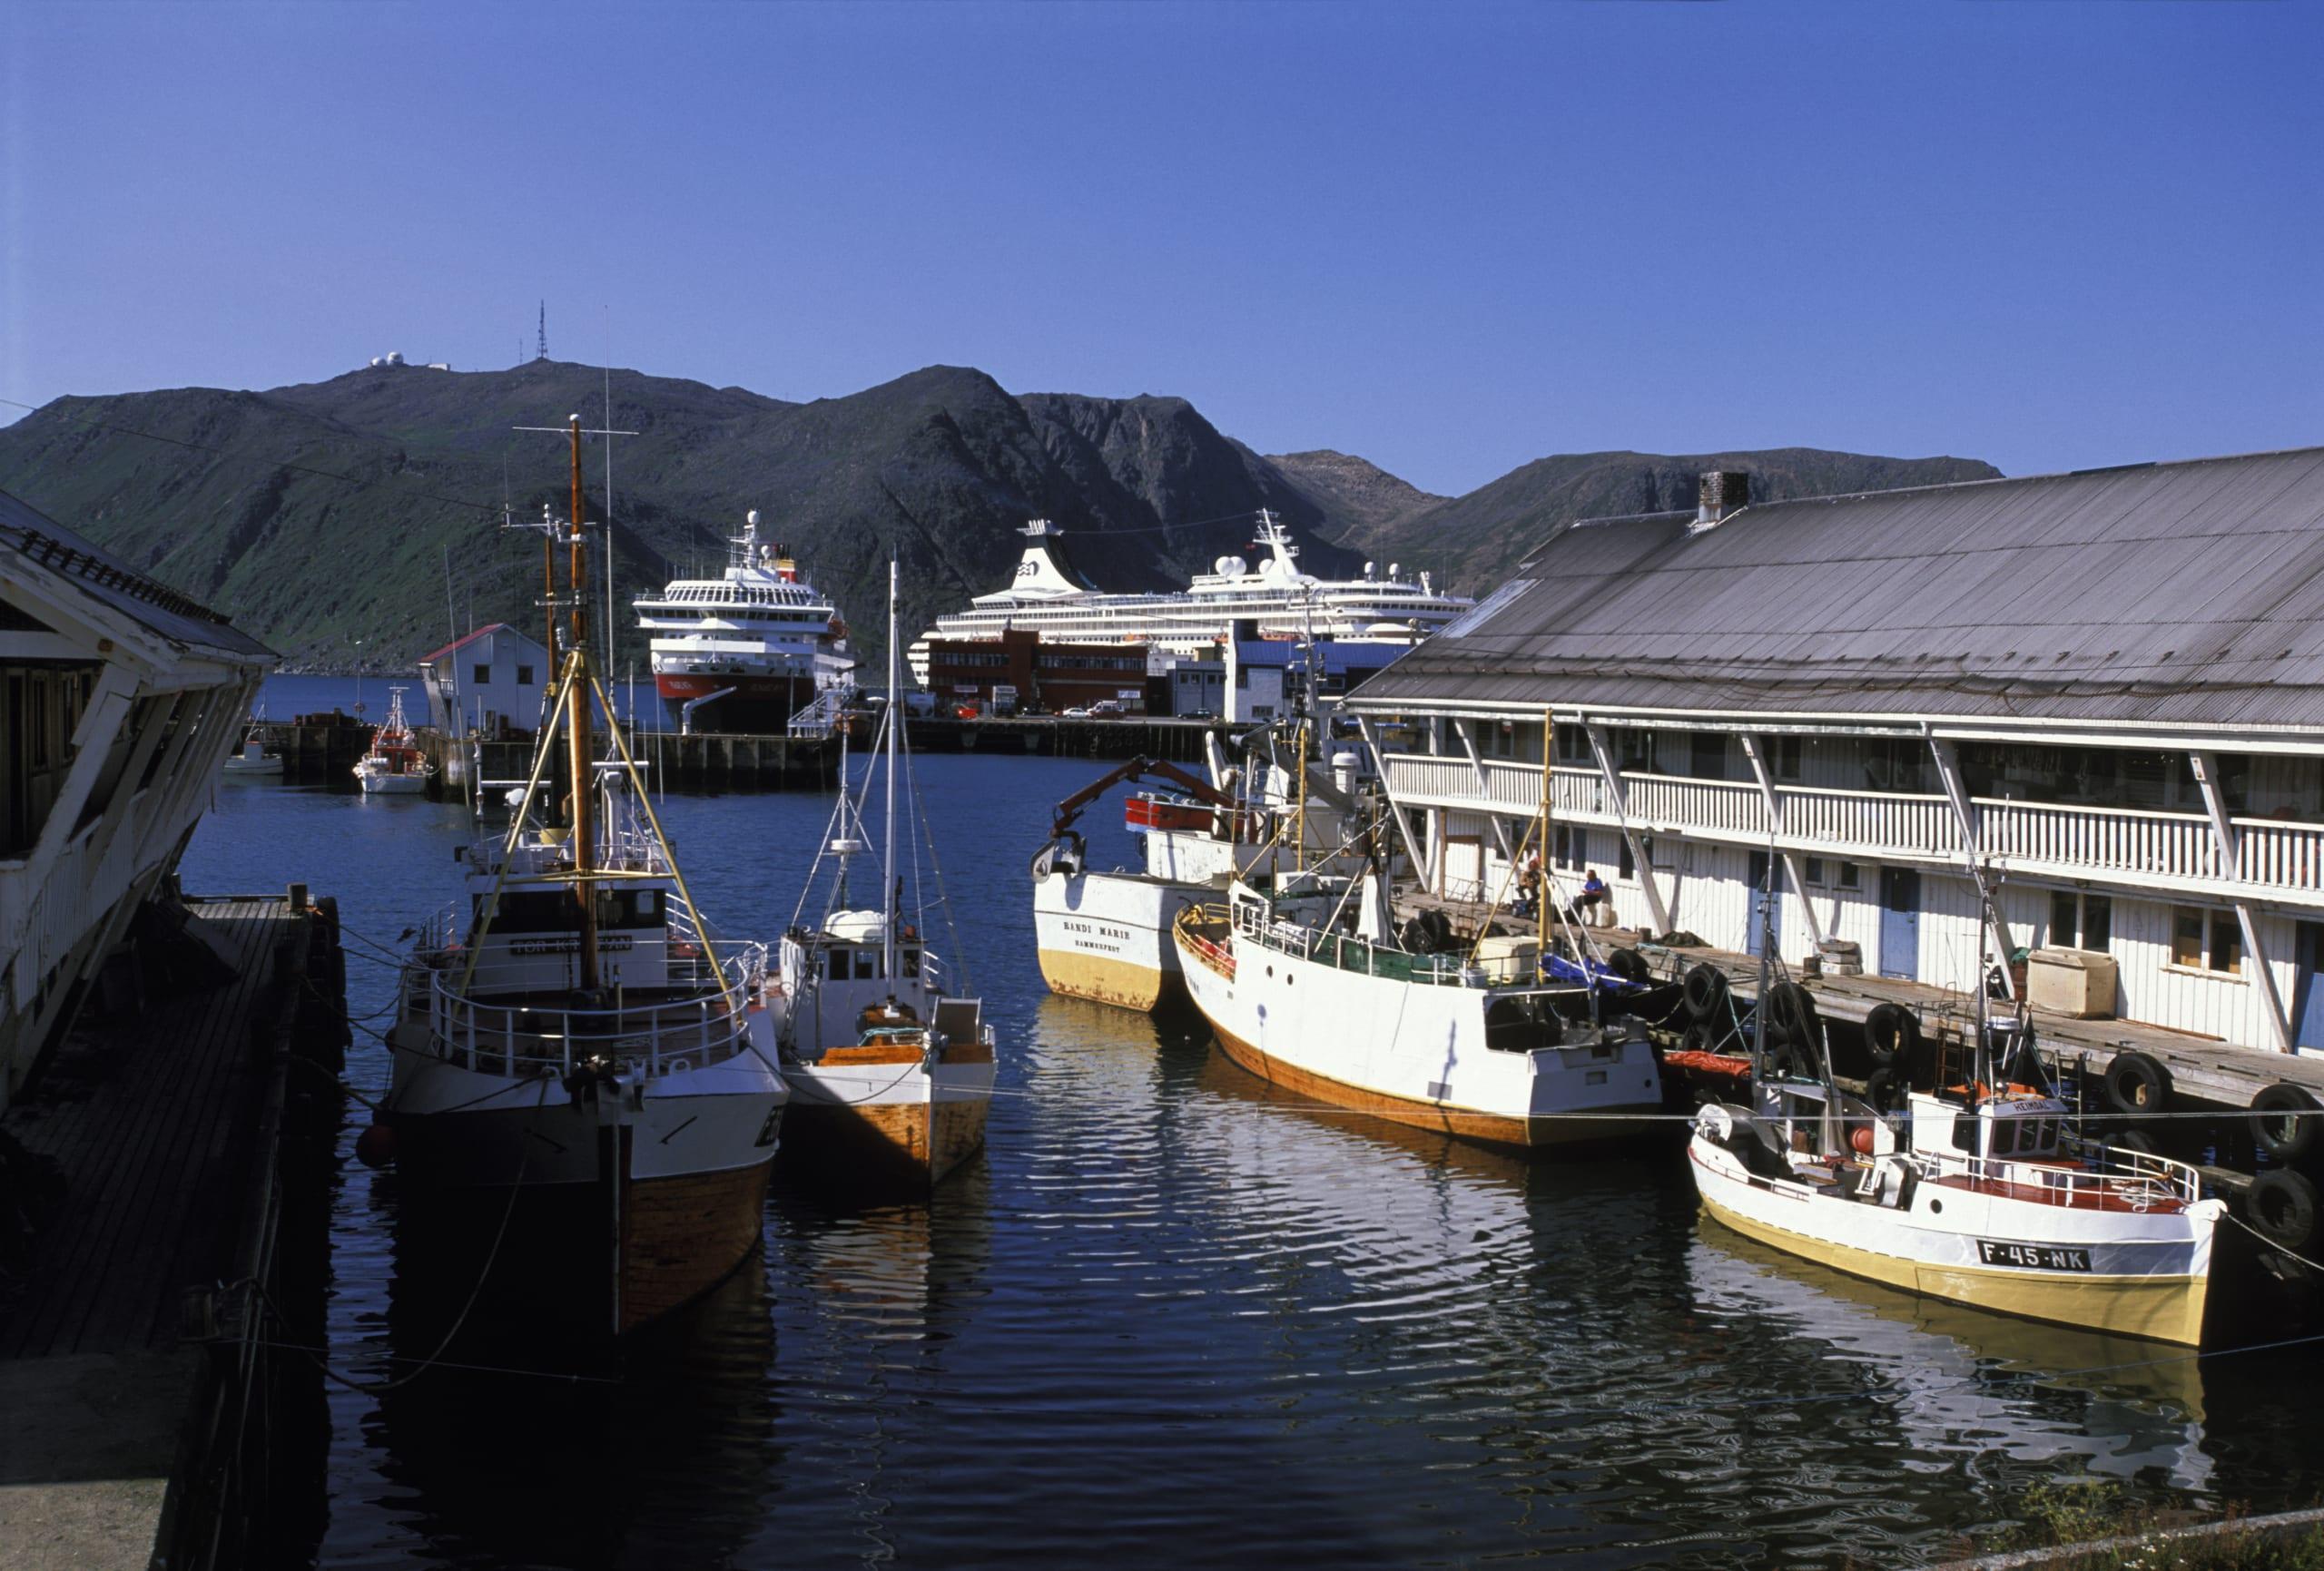 The harbor of Honningsvåg